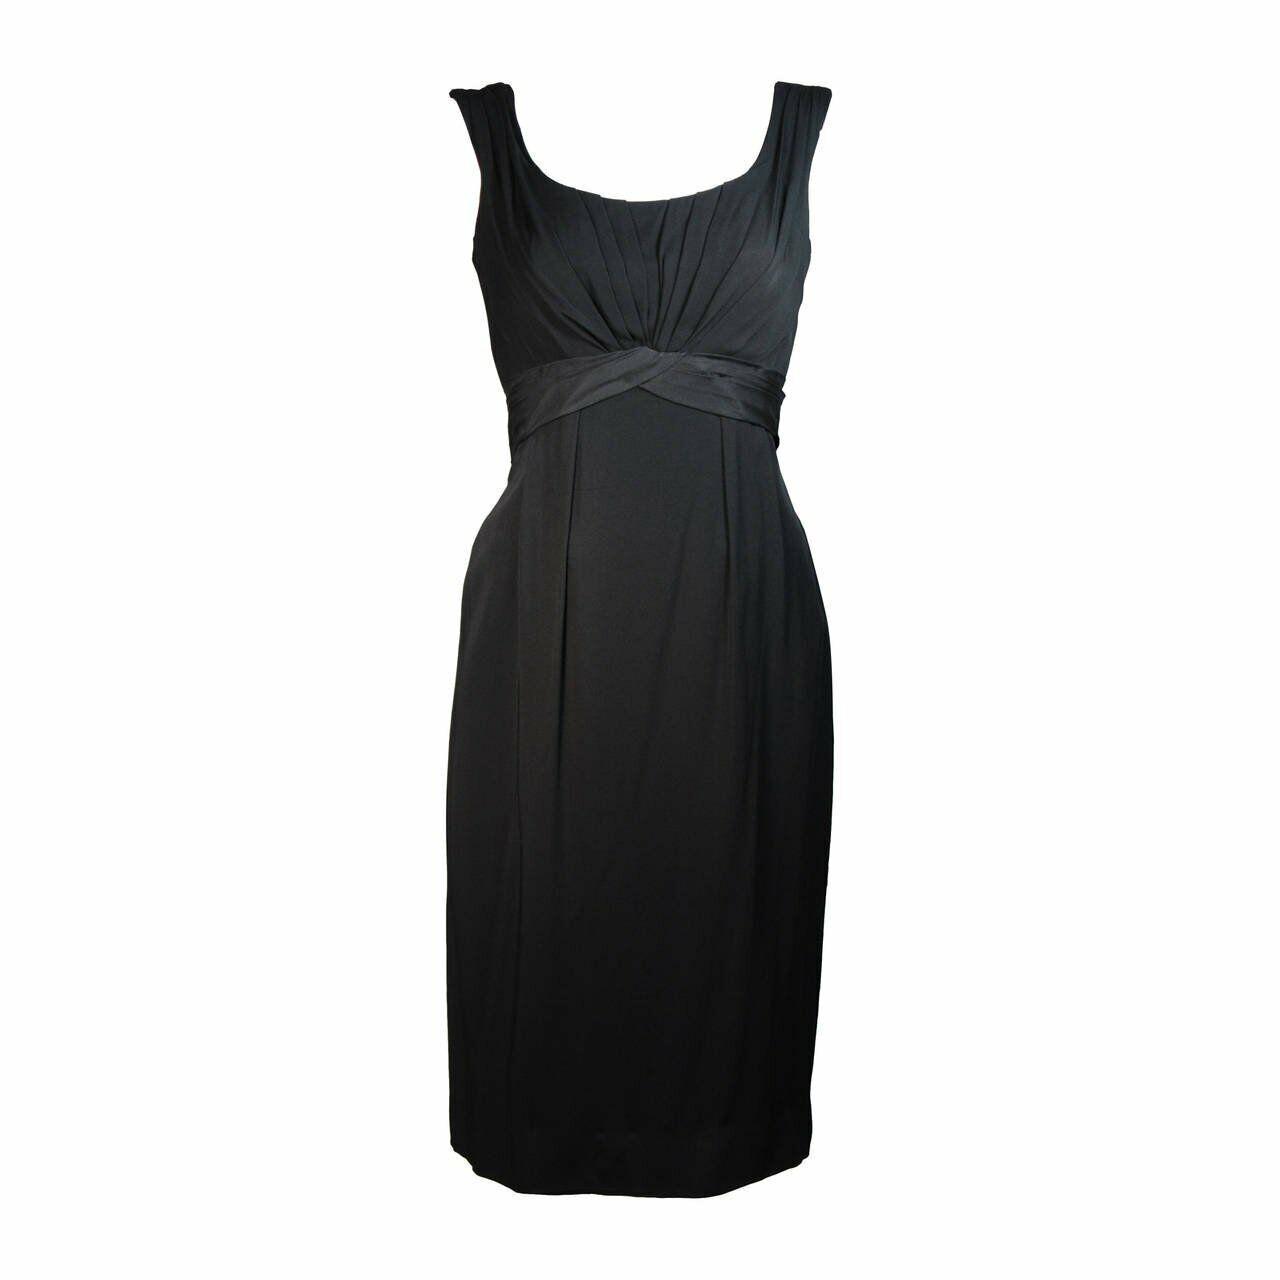 CEIL CHAPMAN 1950s Black Draped Cocktail Dress Si… - image 1